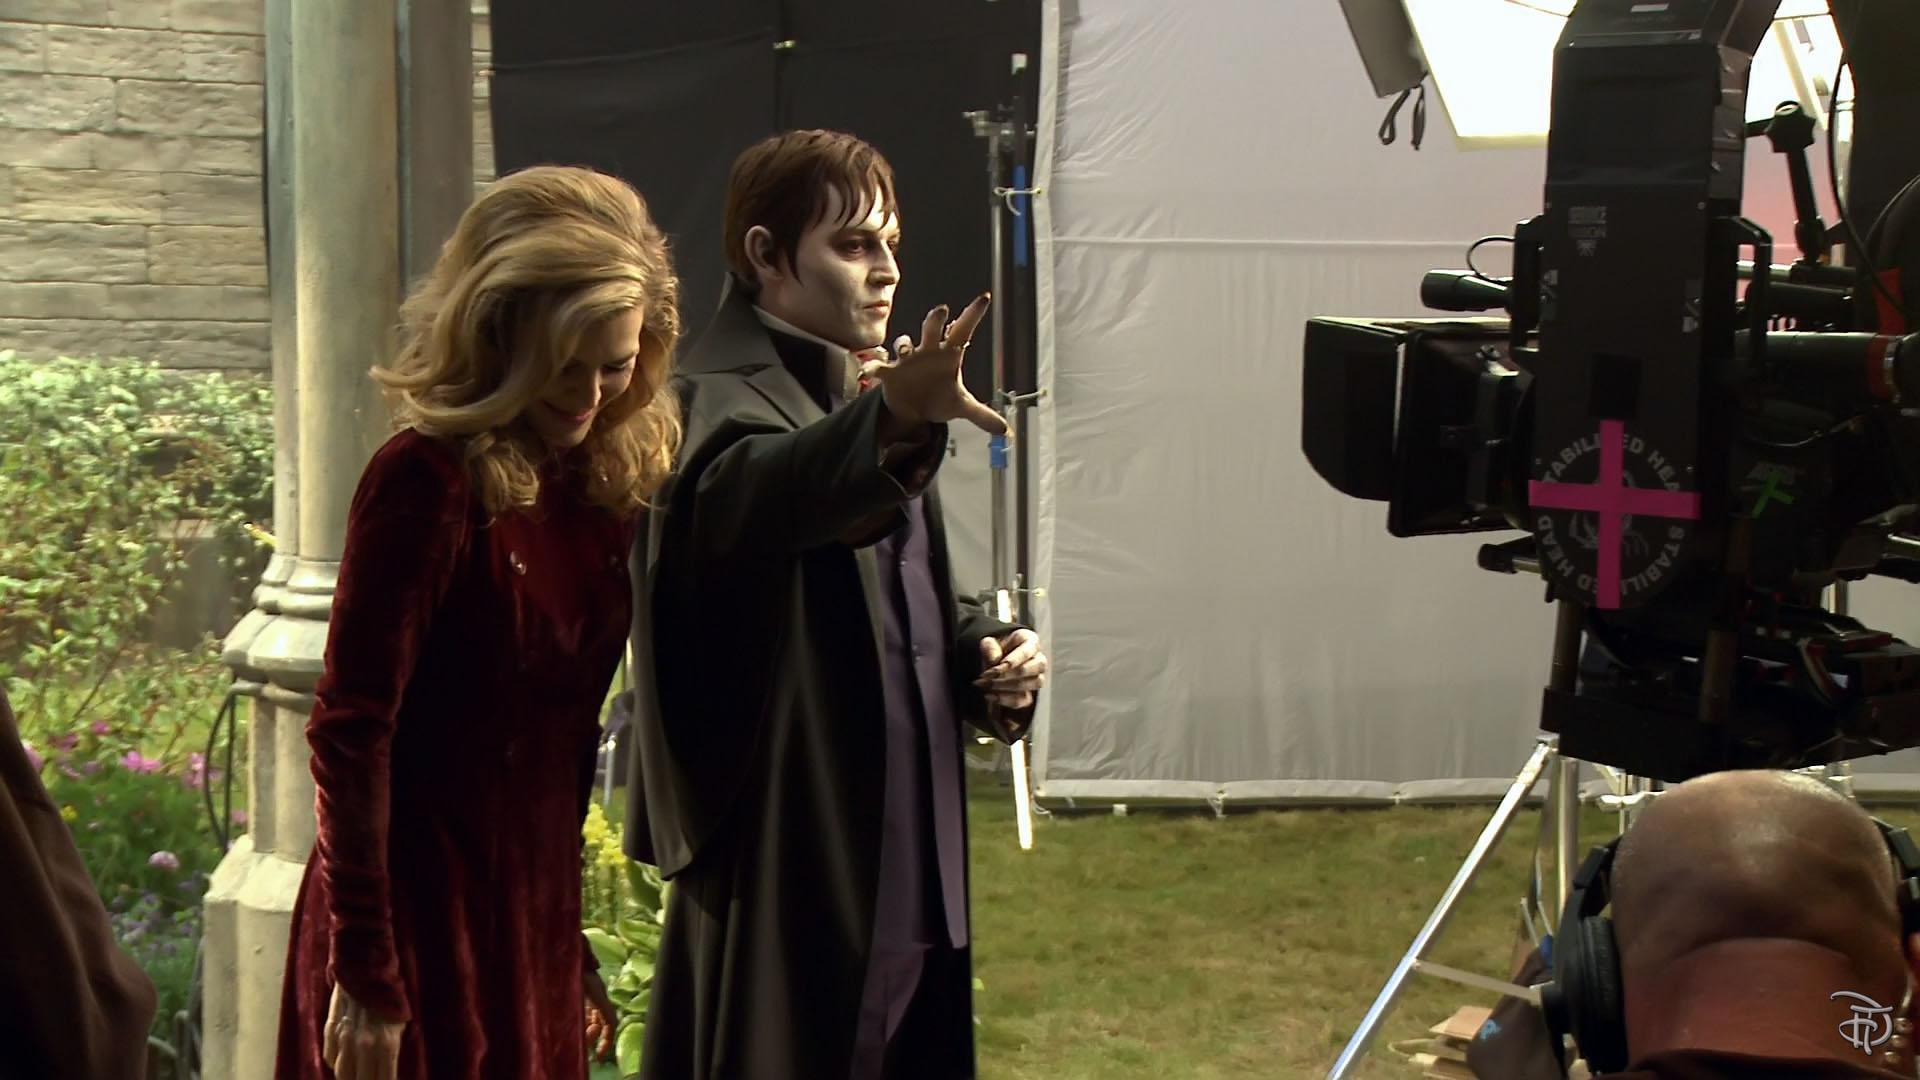 Dark Shadows behind the scenes